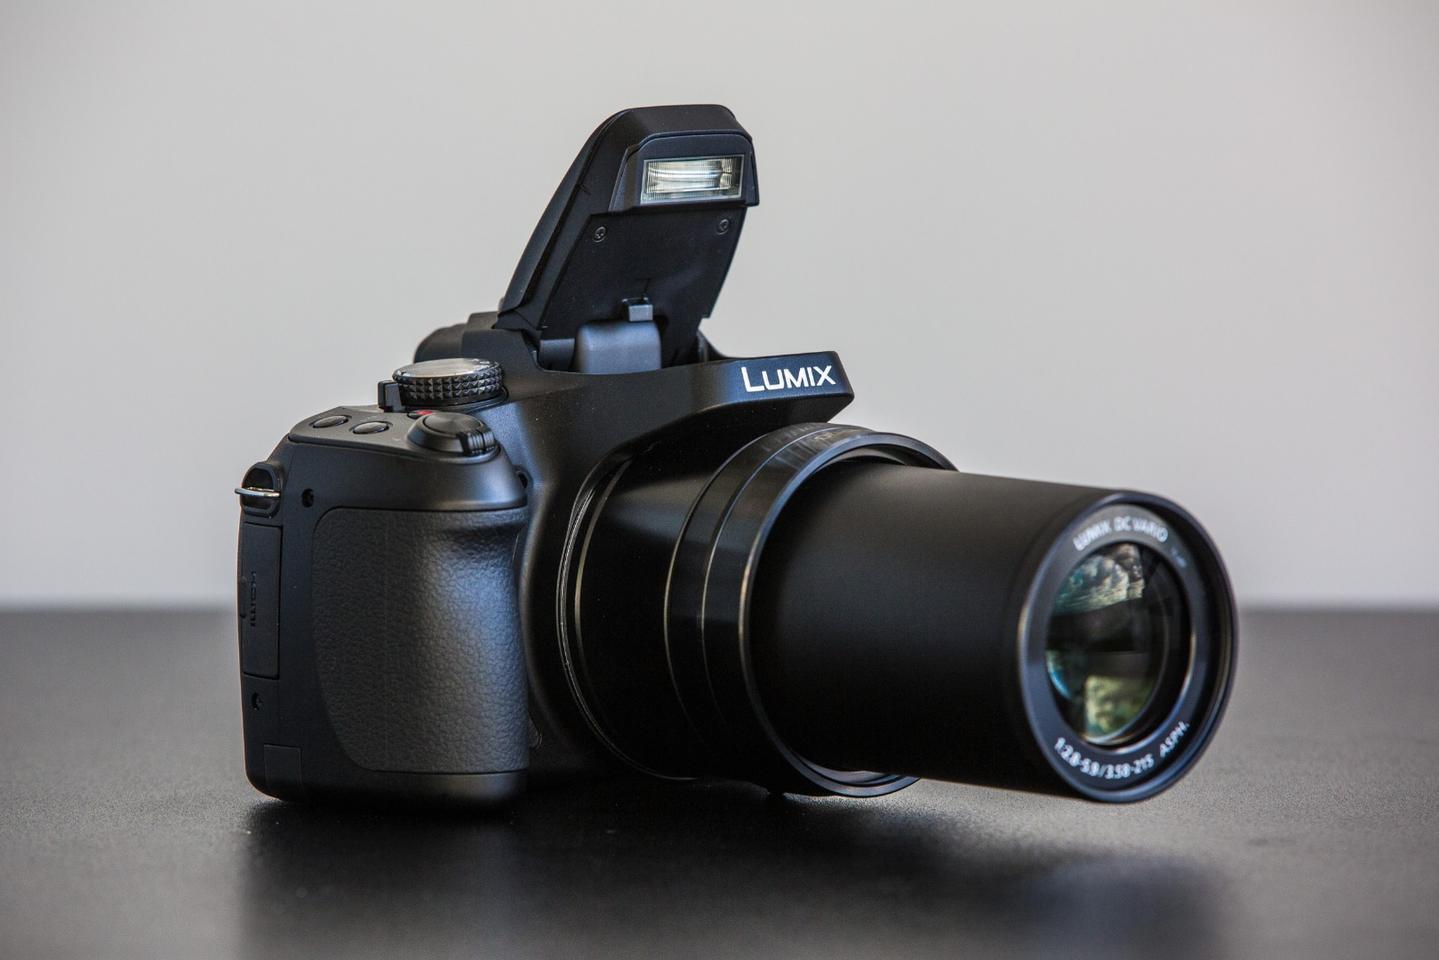 Panasonic DC-FZ80: it's happy to see you